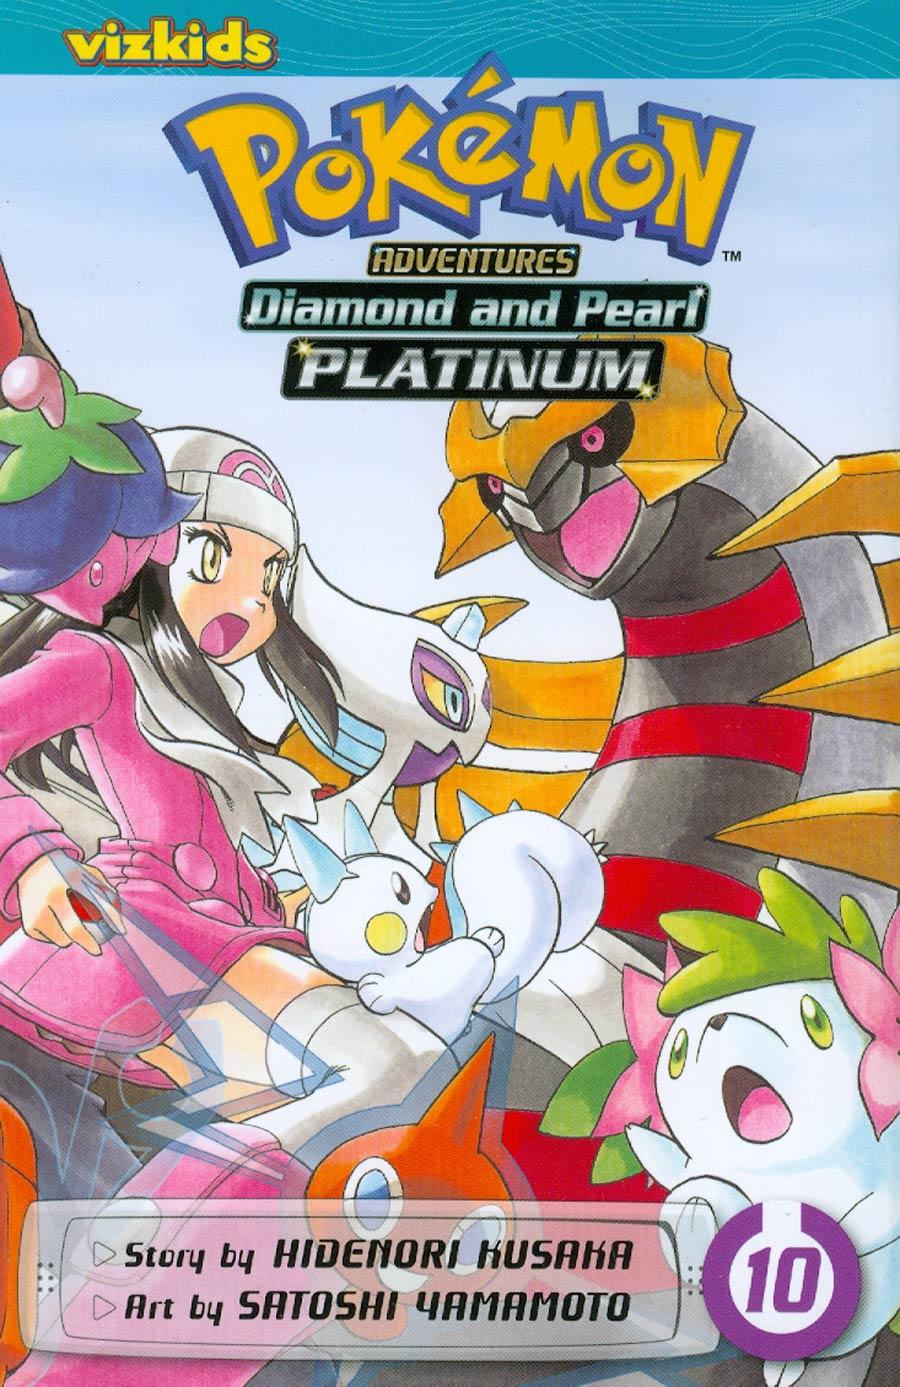 Pokemon Adventures Diamond And Pearl Platinum Vol 10 GN